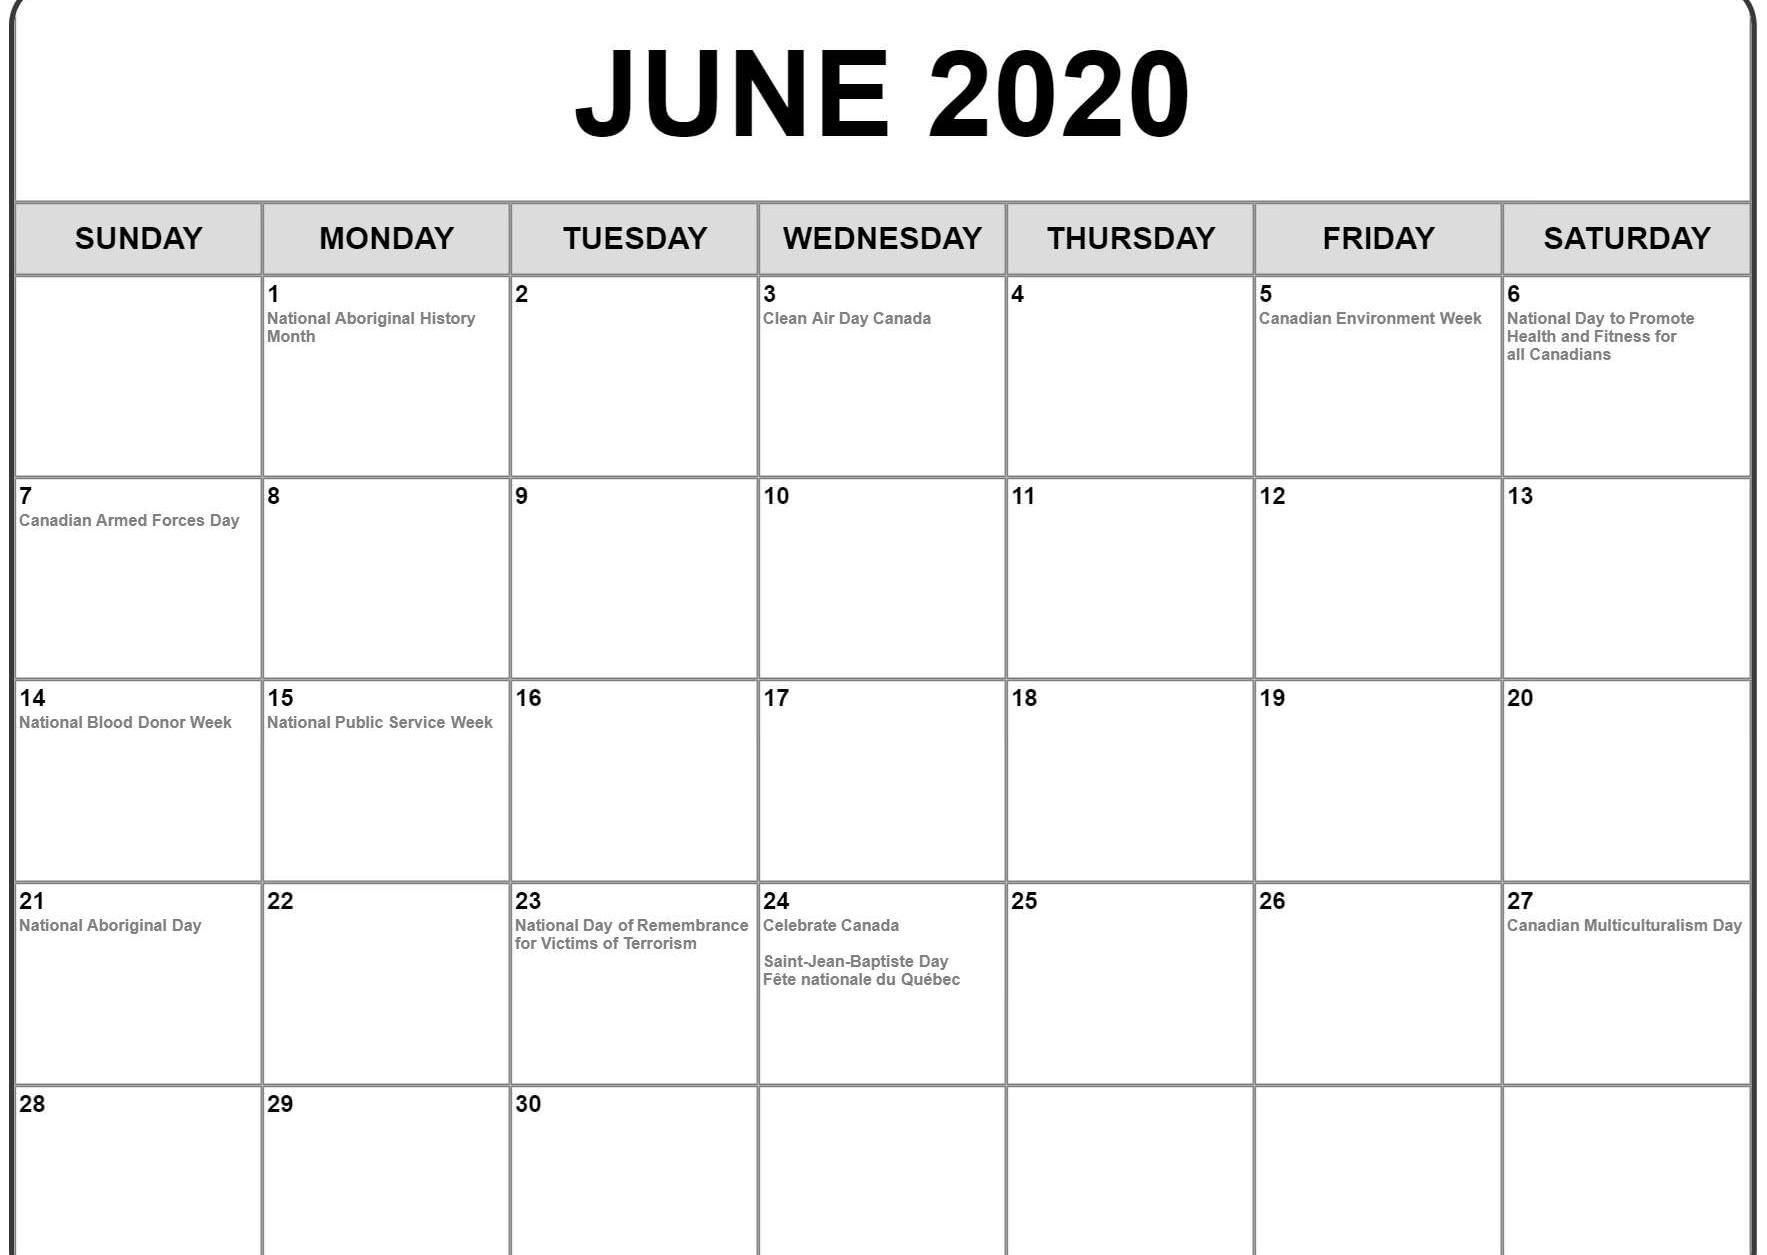 June 2020 Calendar With Holidays | Calendar Template